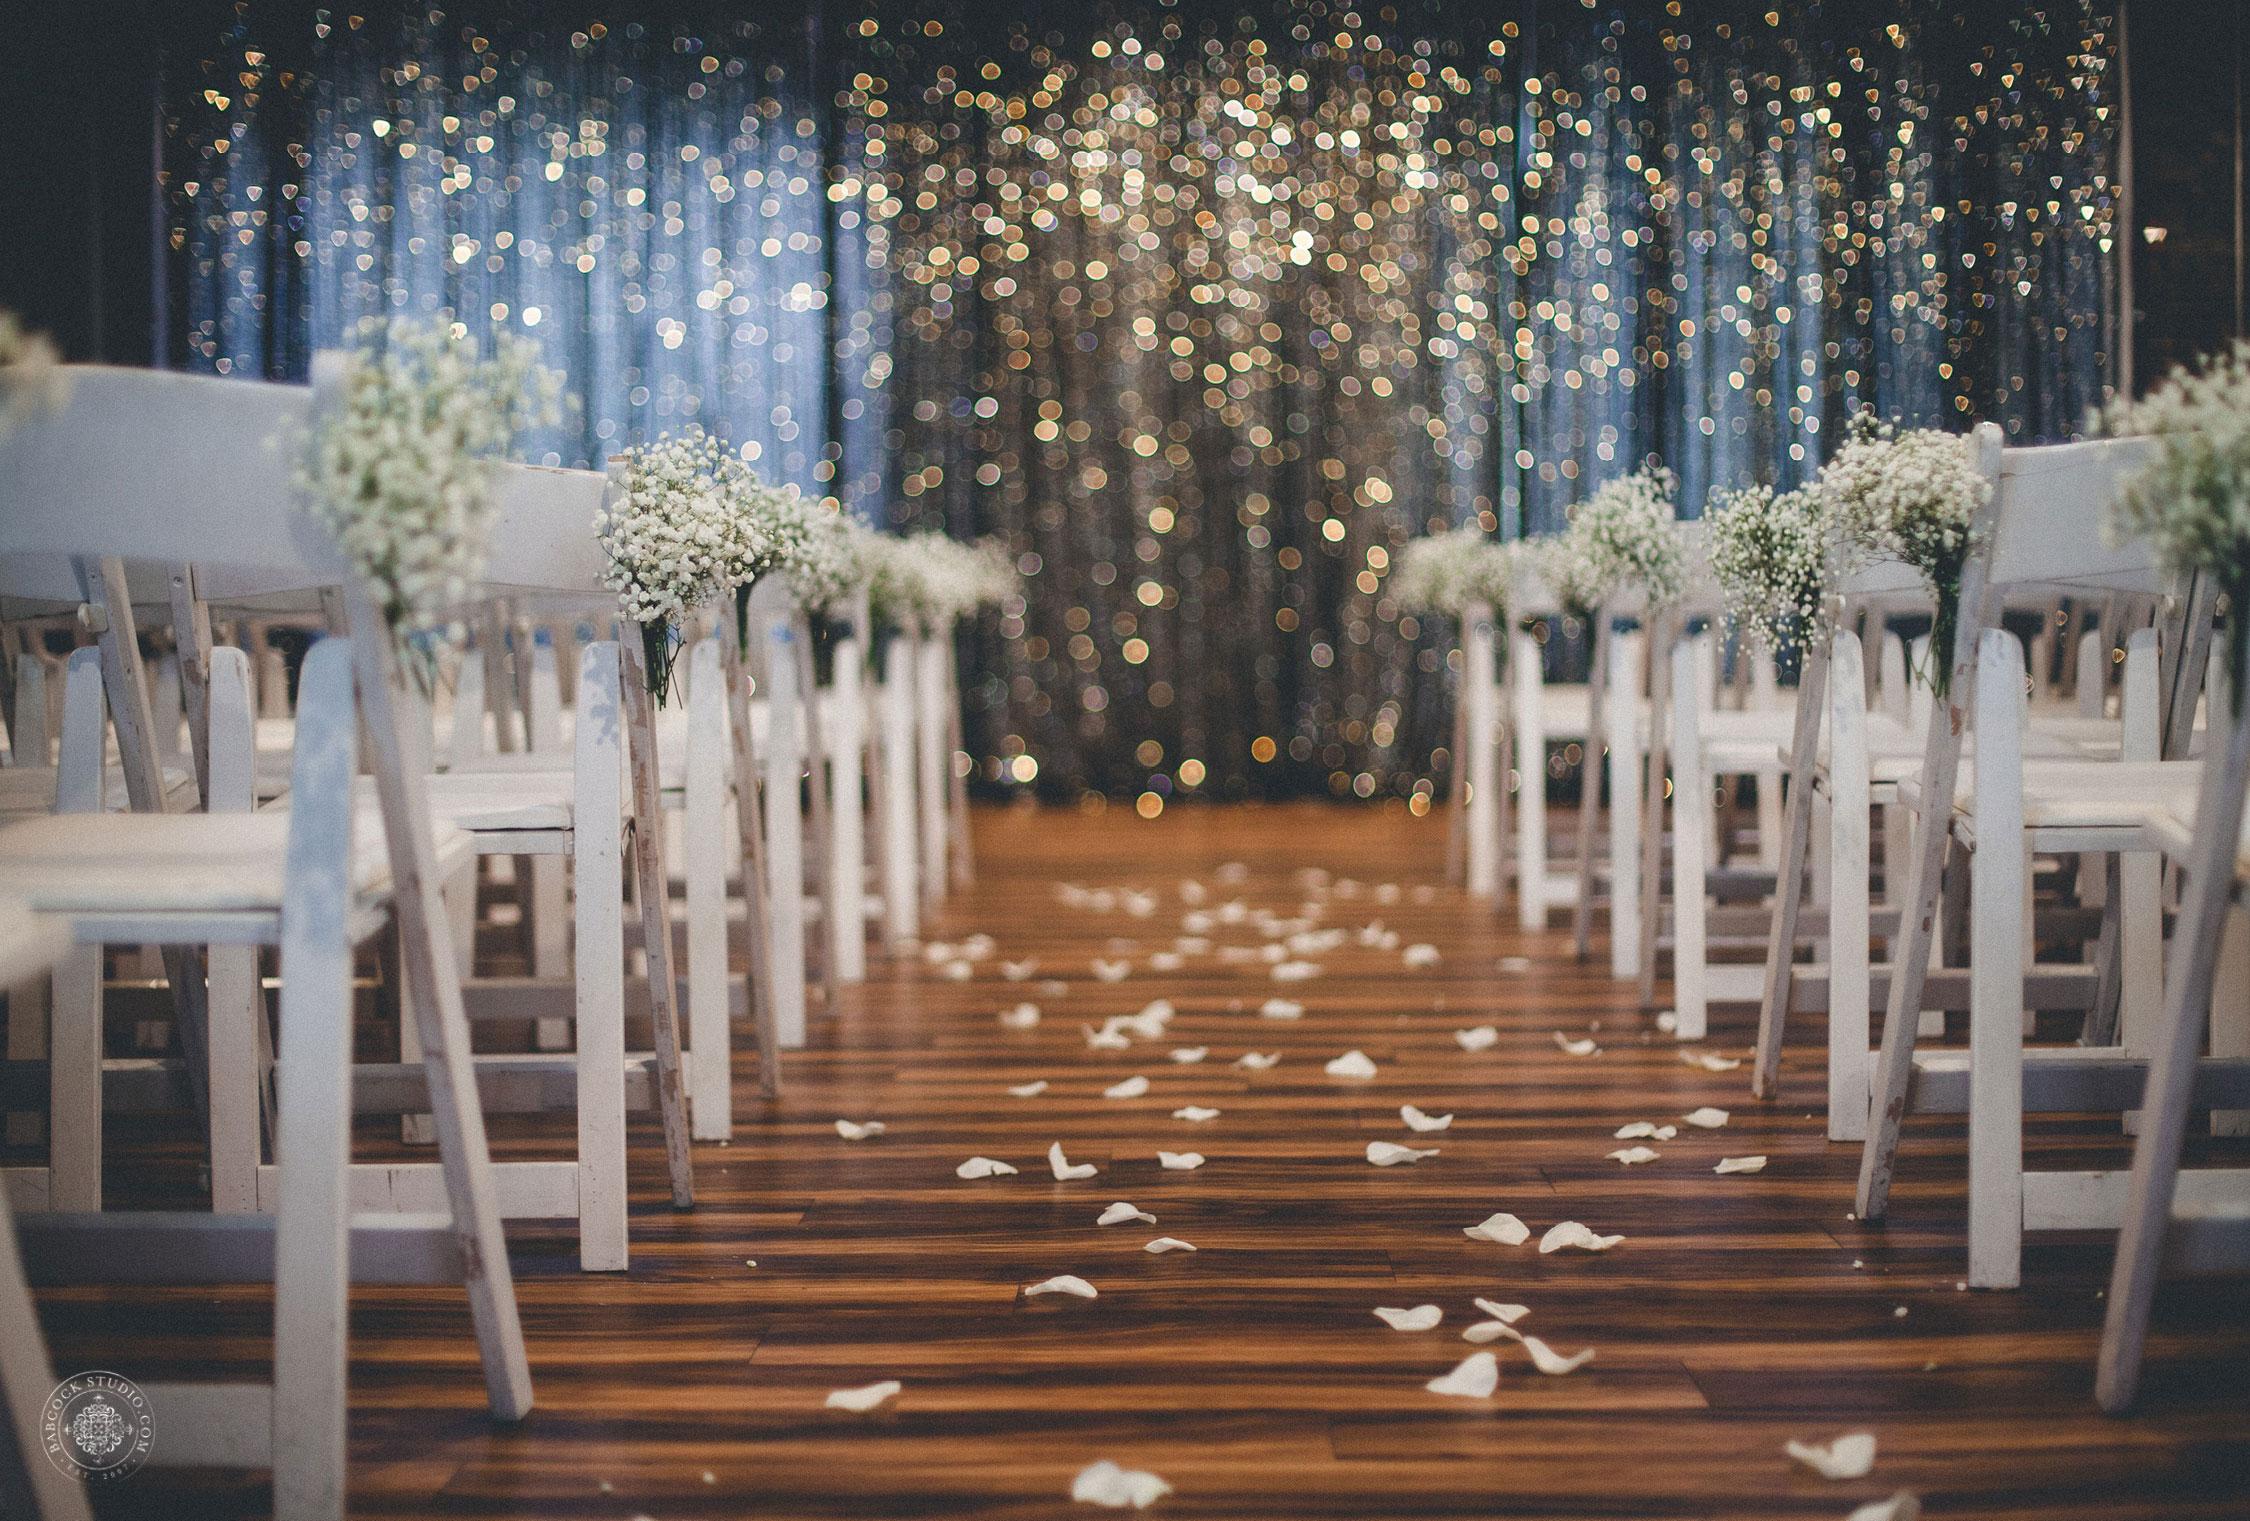 erica-nick-wedding-photographer-dayton-ohio-11.jpg